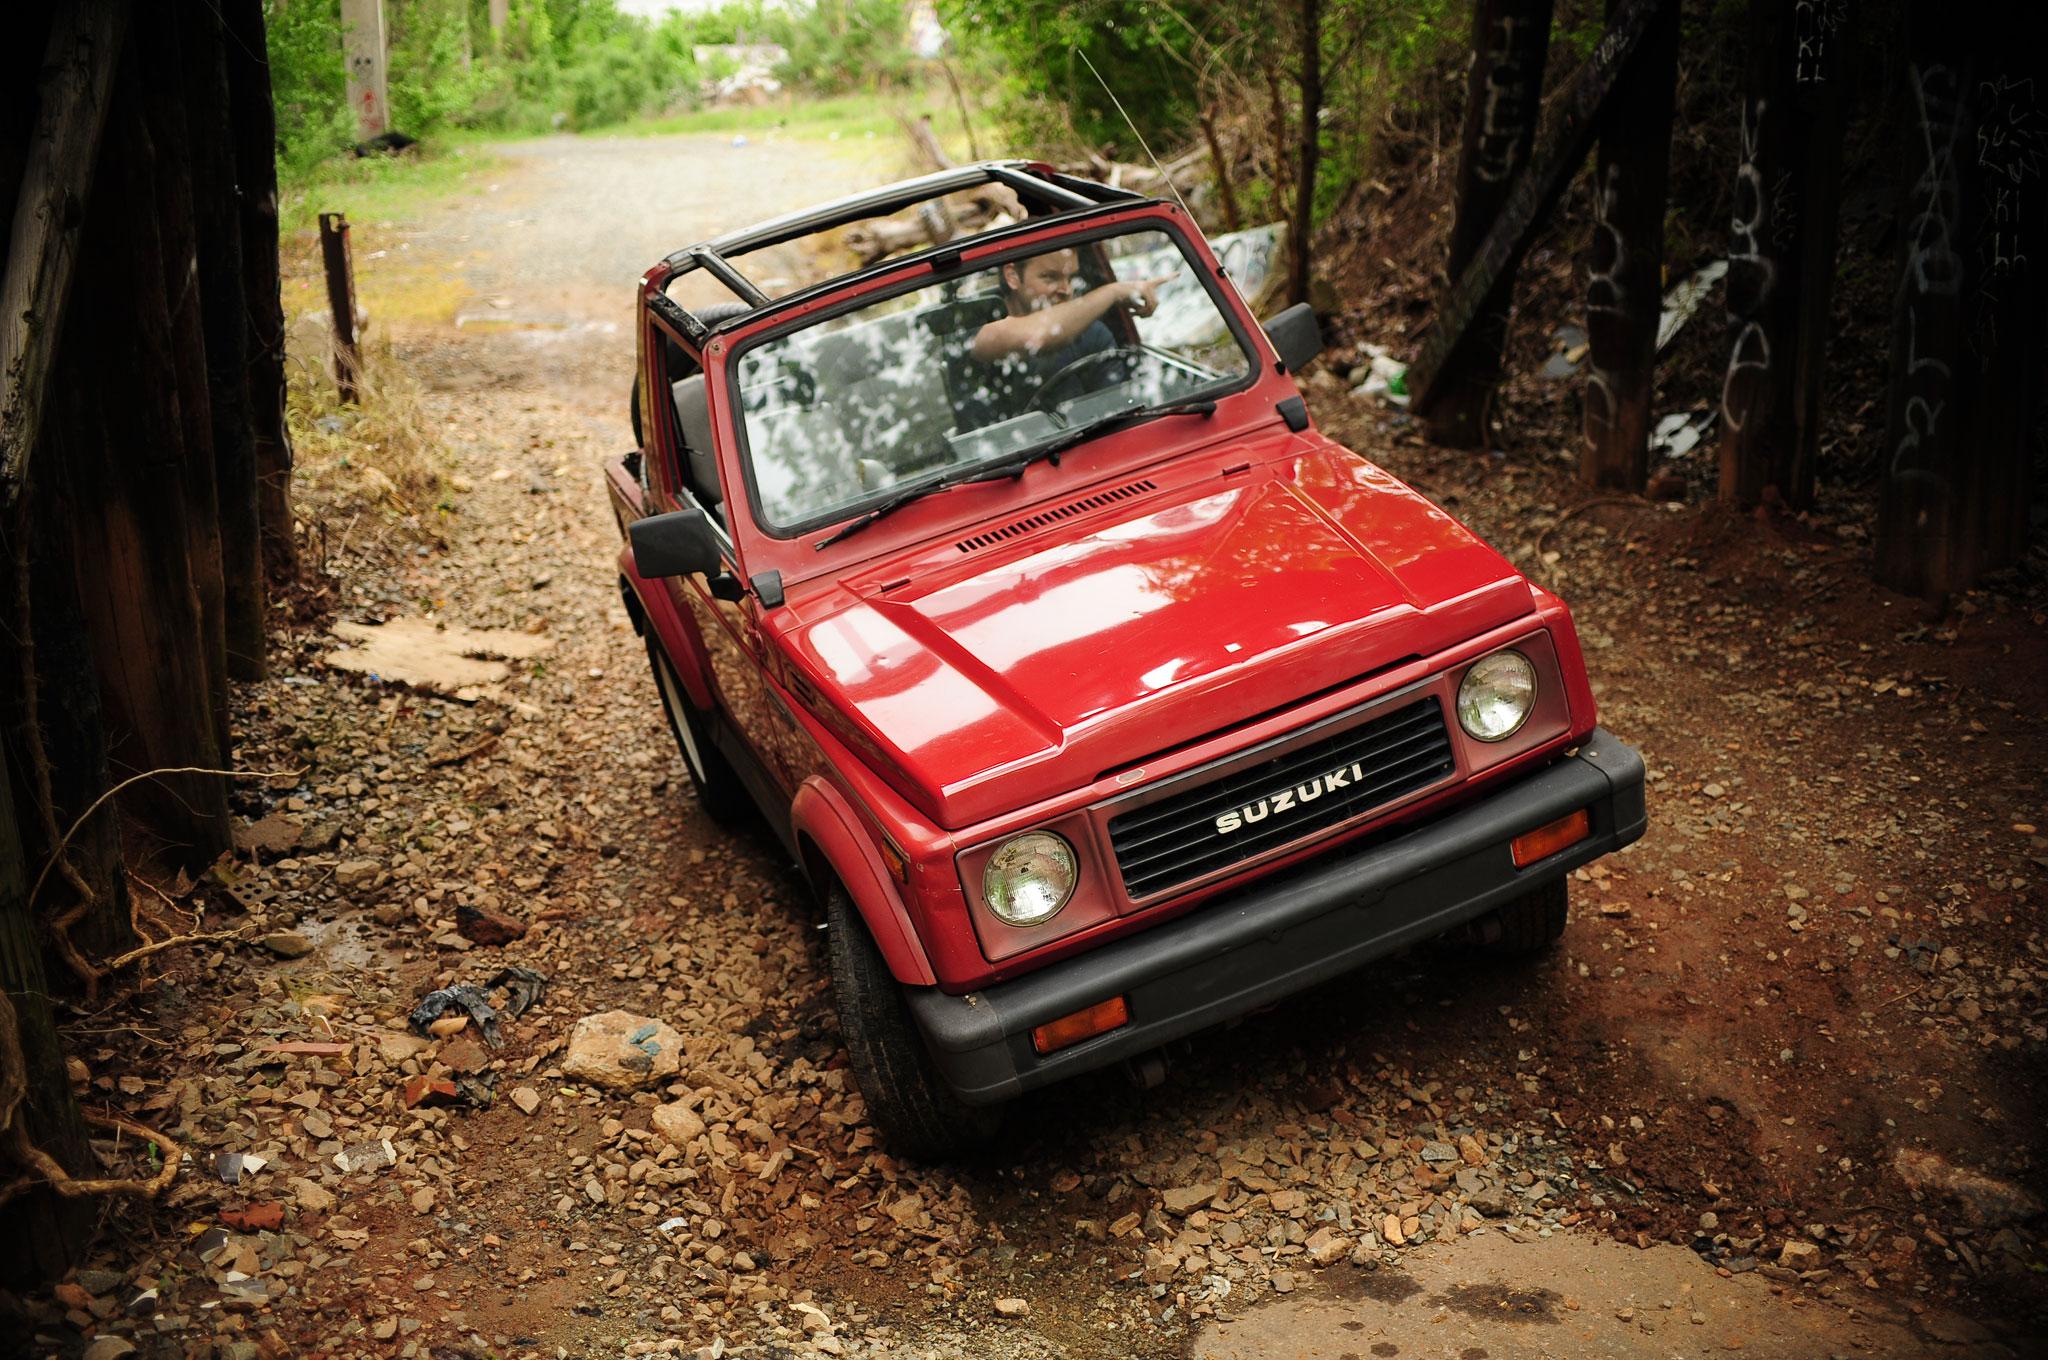 1986 1995 Suzuki Samurai Front Right View1